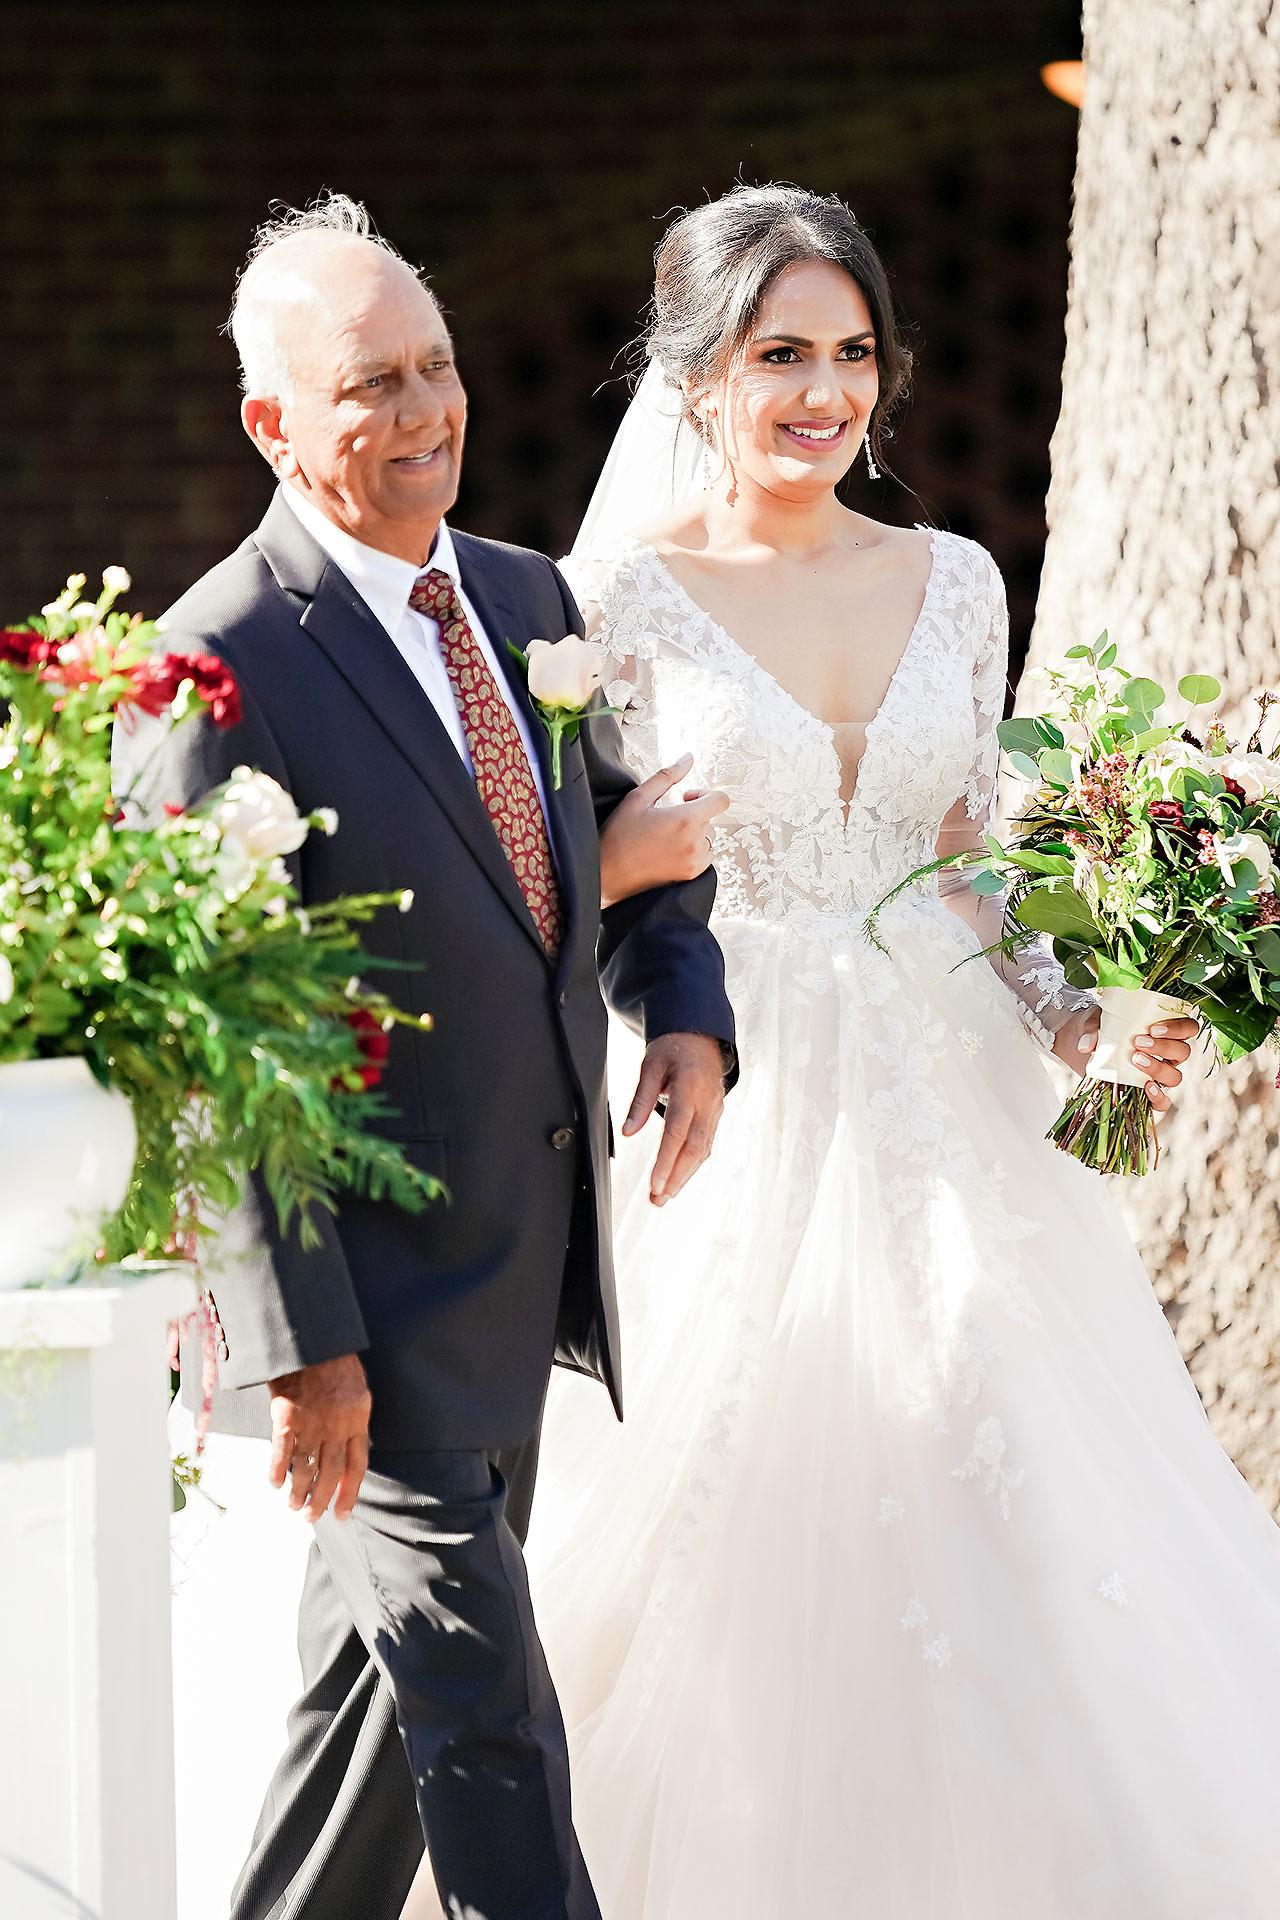 Nadia Parker Black Iris Estate Carmel Indiana Wedding May 2021 170